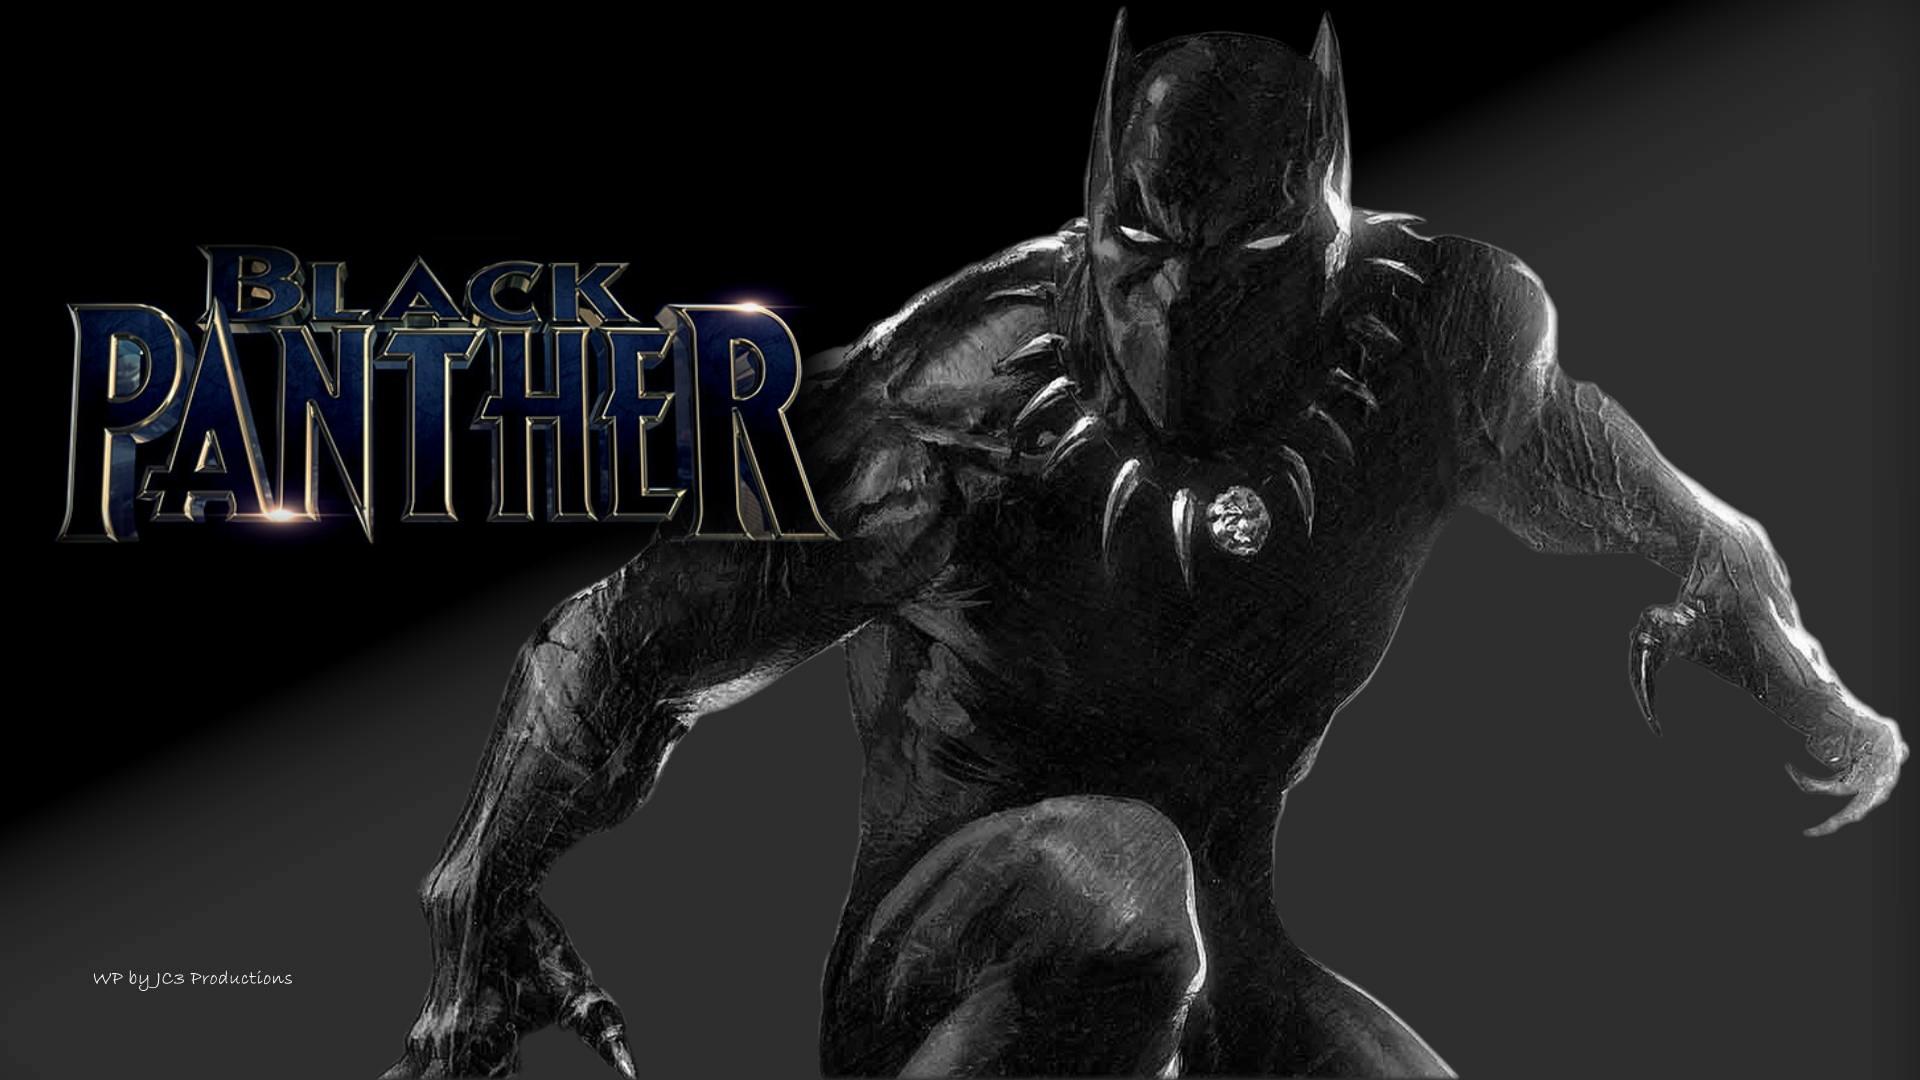 Car 5760x1080 Wallpaper Black Panther Comic Book Images Black Panther 5b Hd